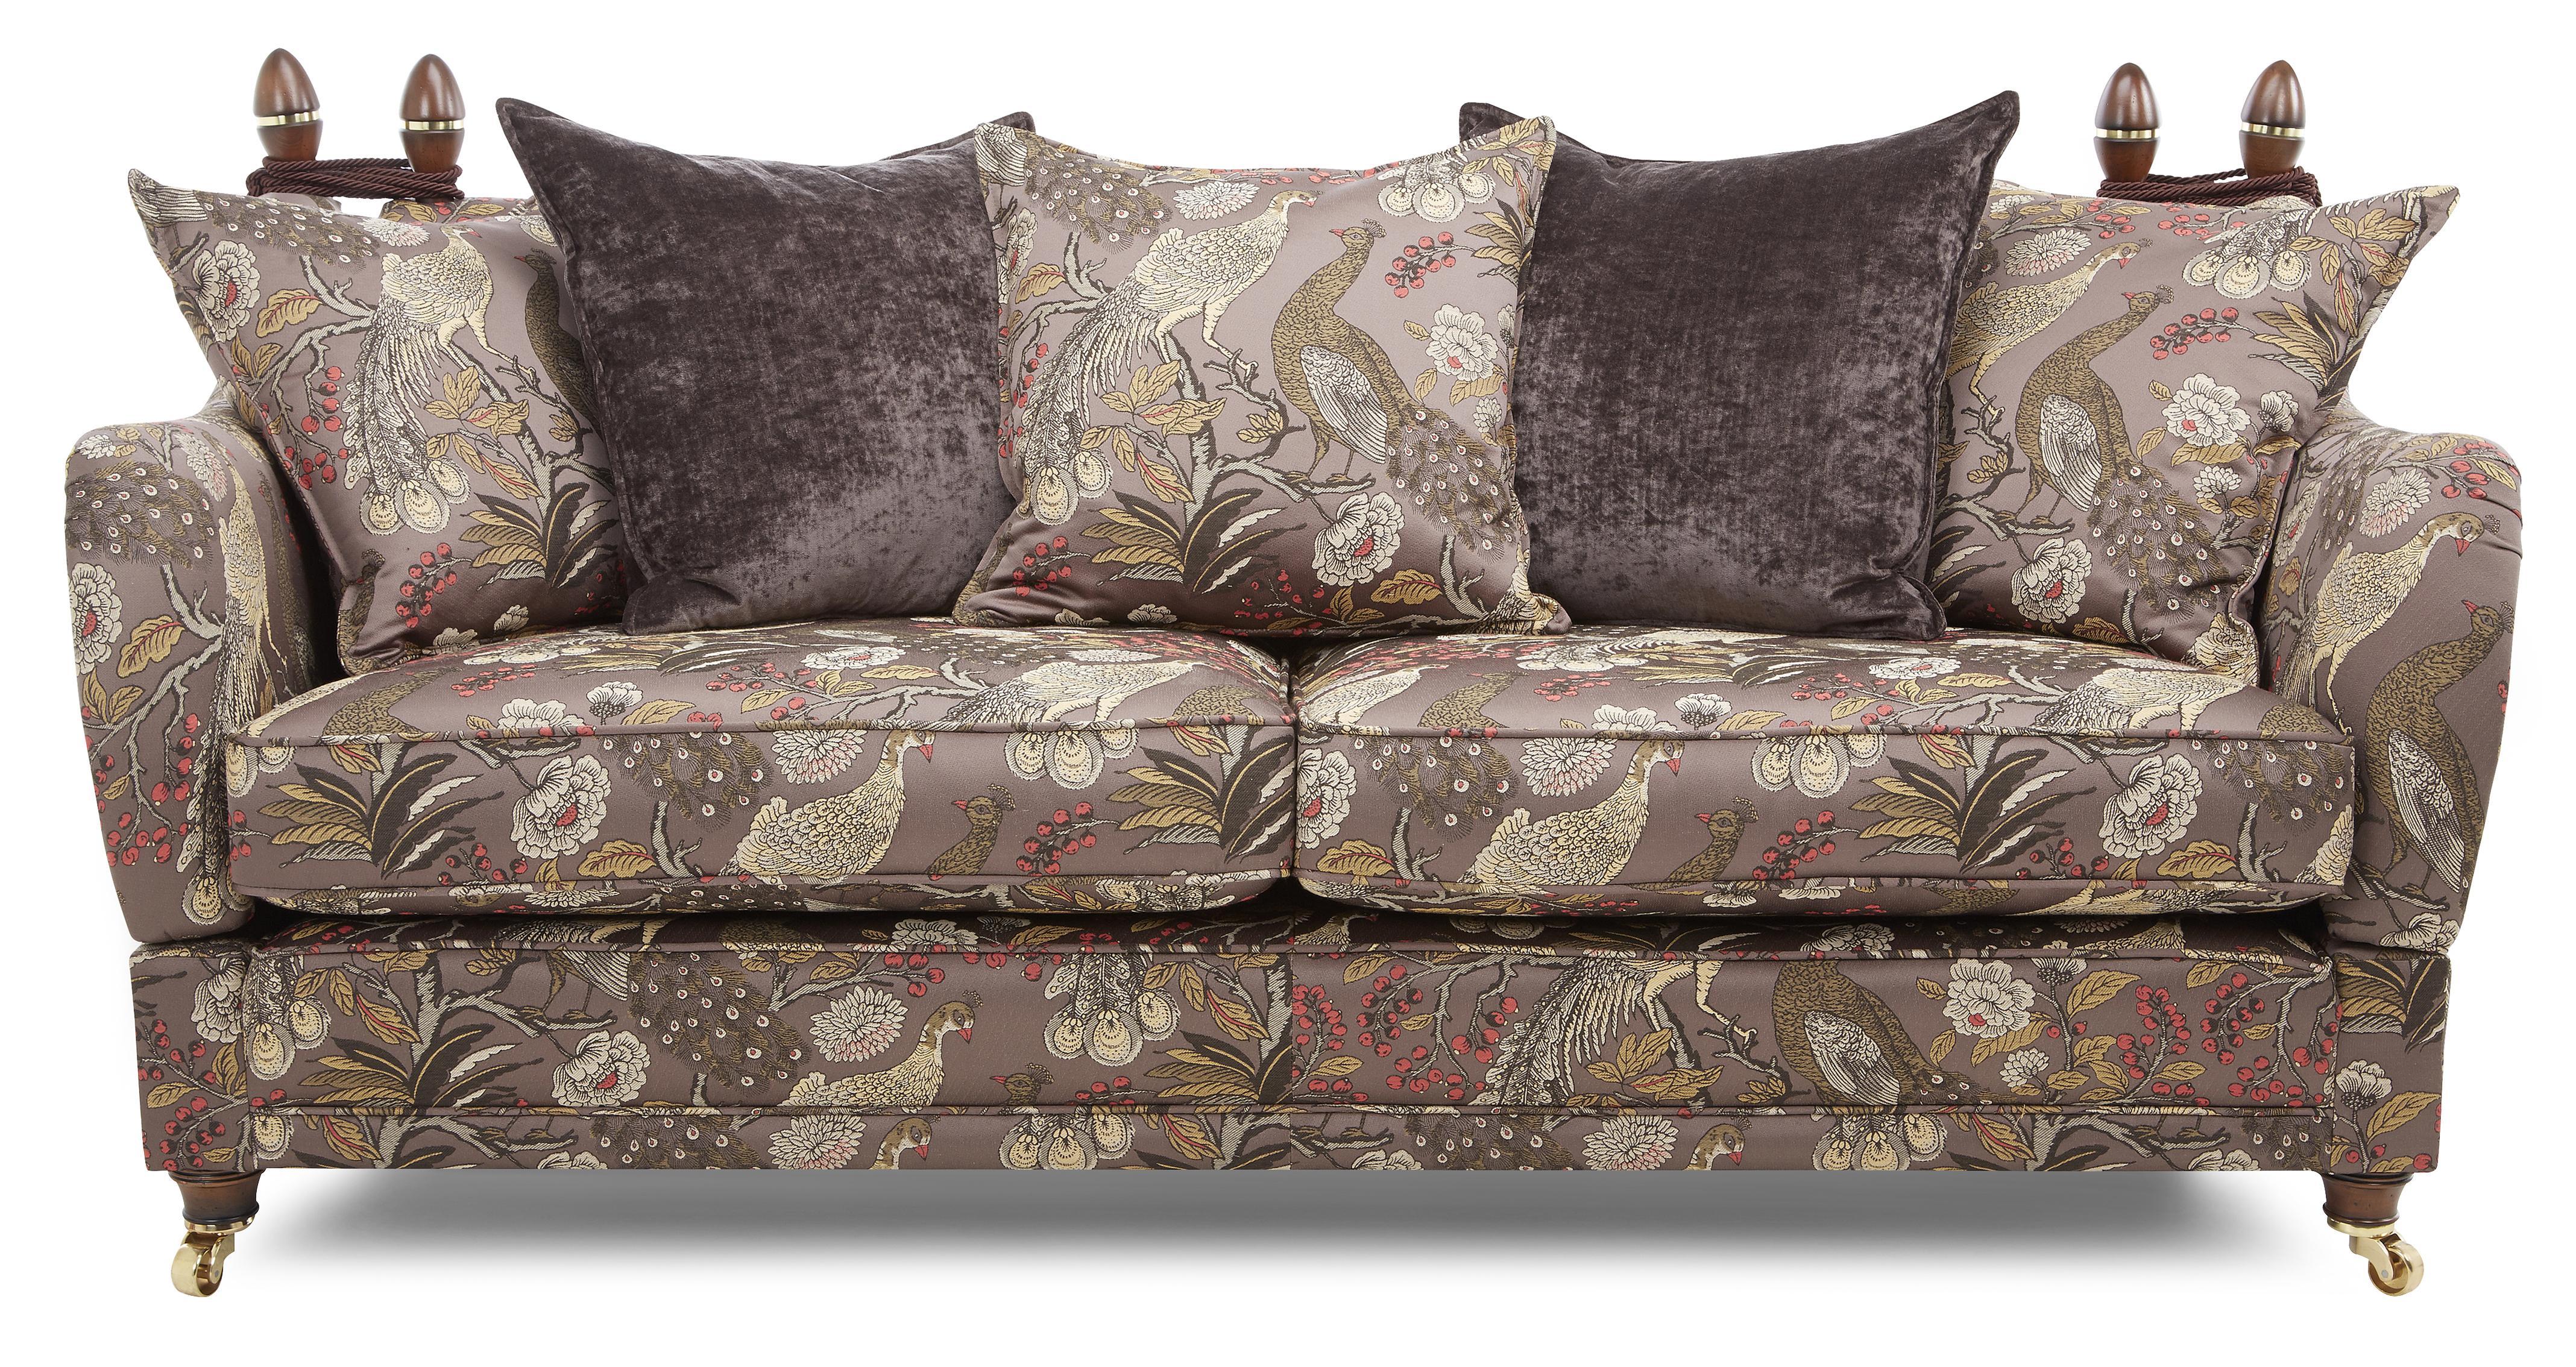 morris 4 seater pattern pillow back sofa dfs rh dfs co uk